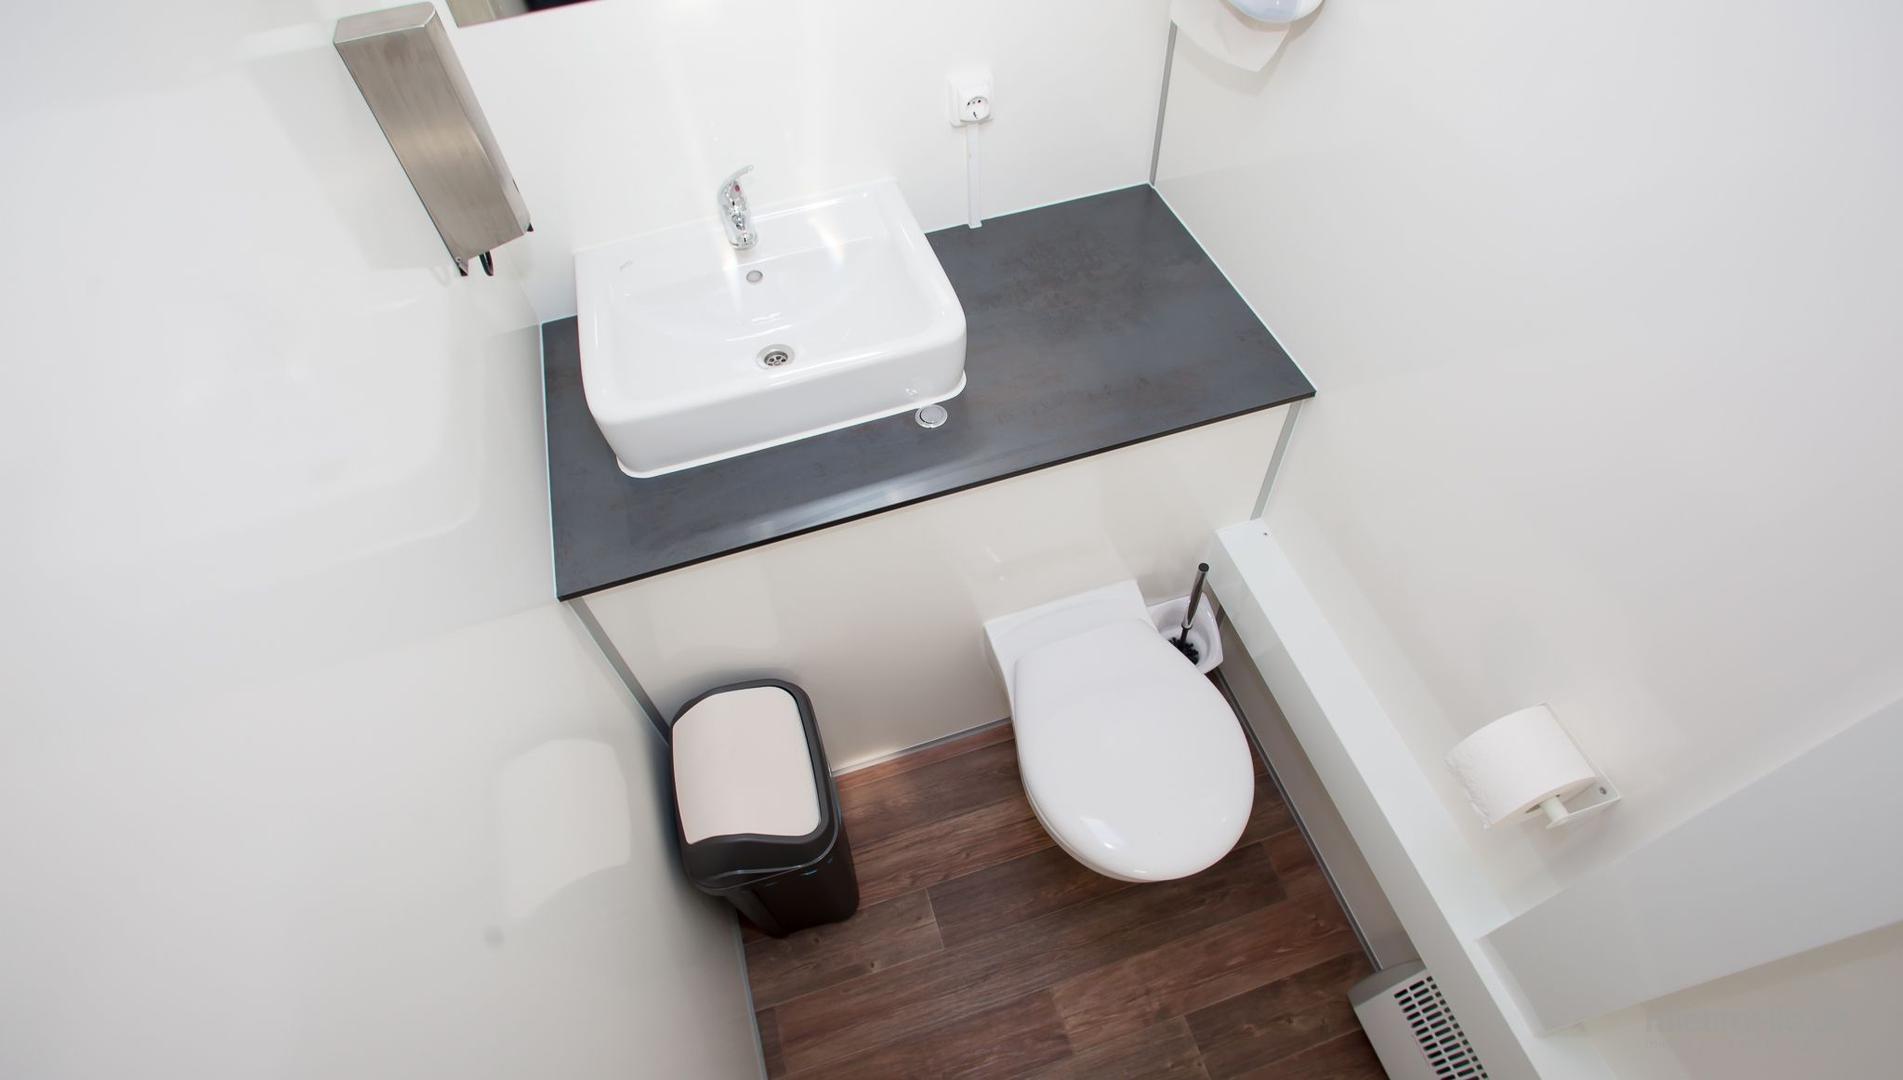 Toilettenwagen mieten & vermieten - Toilettenwagen 1&1 silber in Dorsten